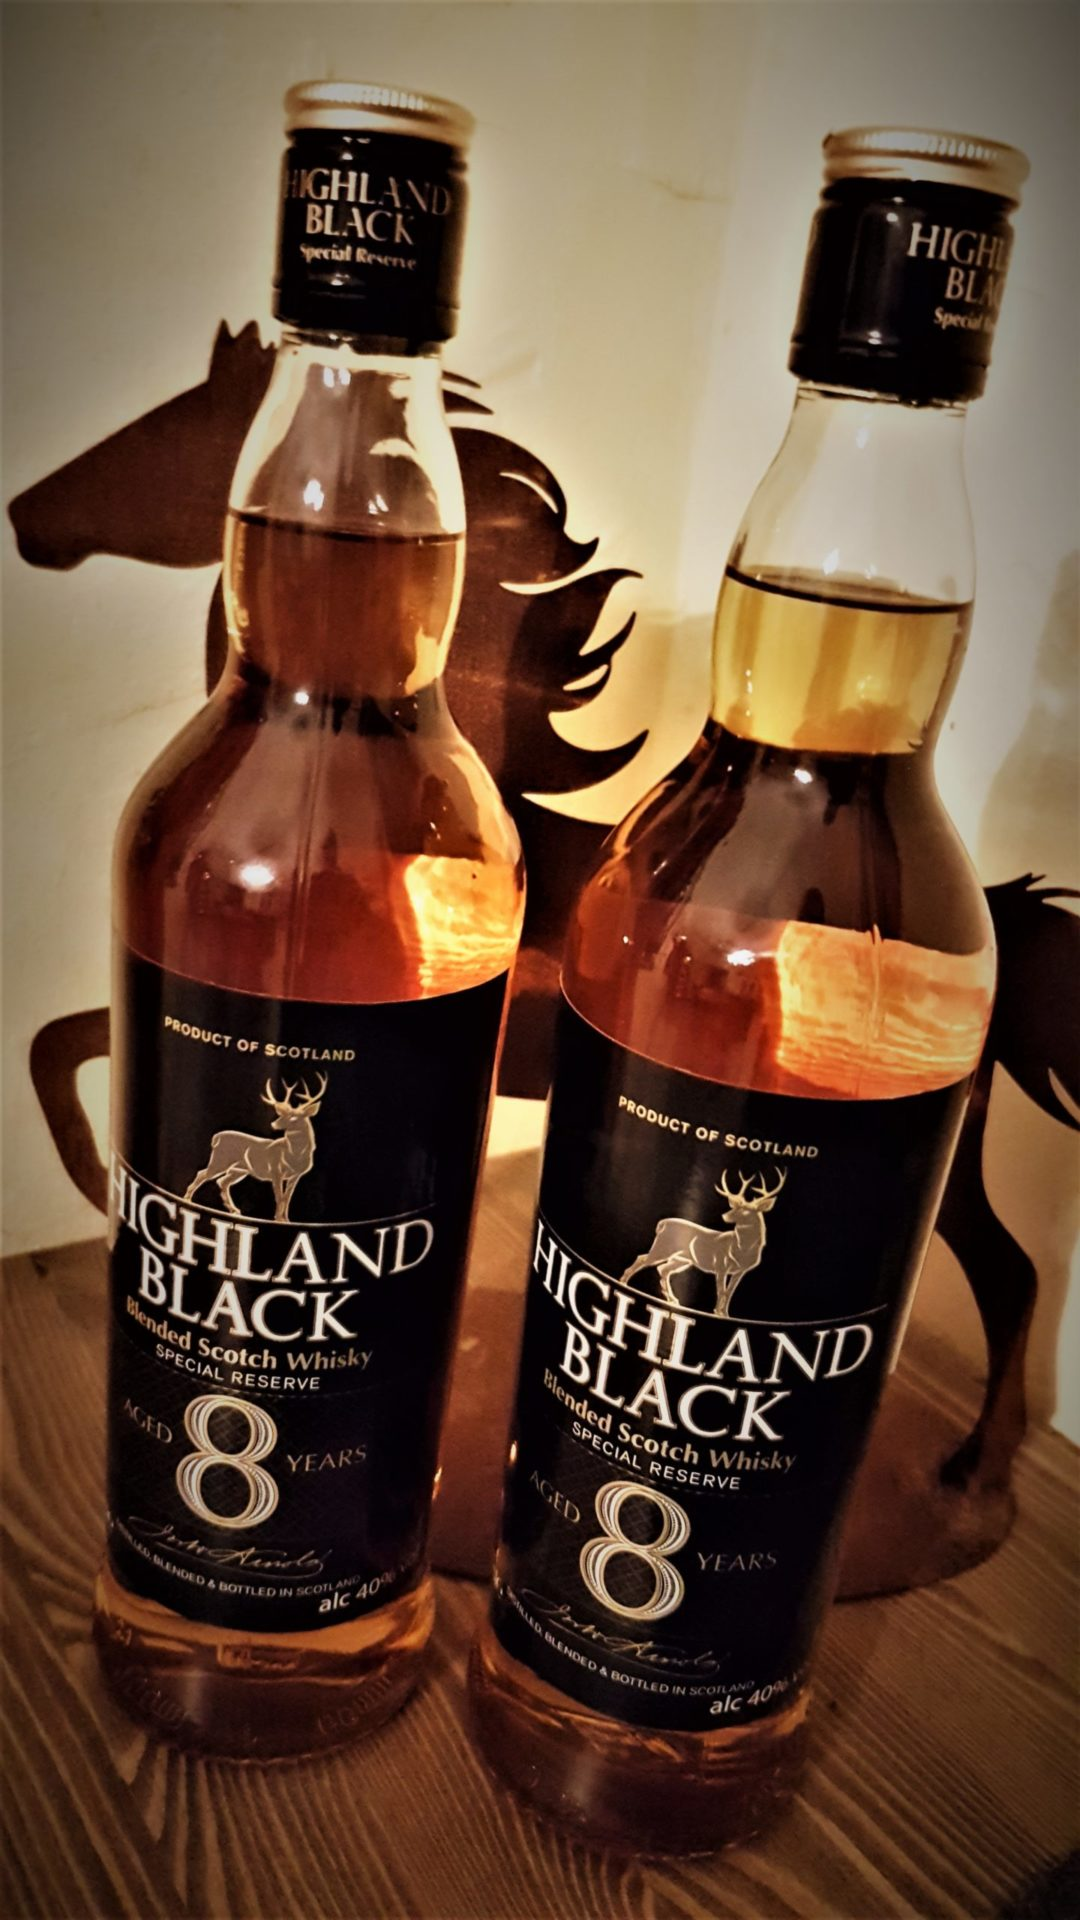 Highland Black 8 Jahre Blended Scotch Whisky